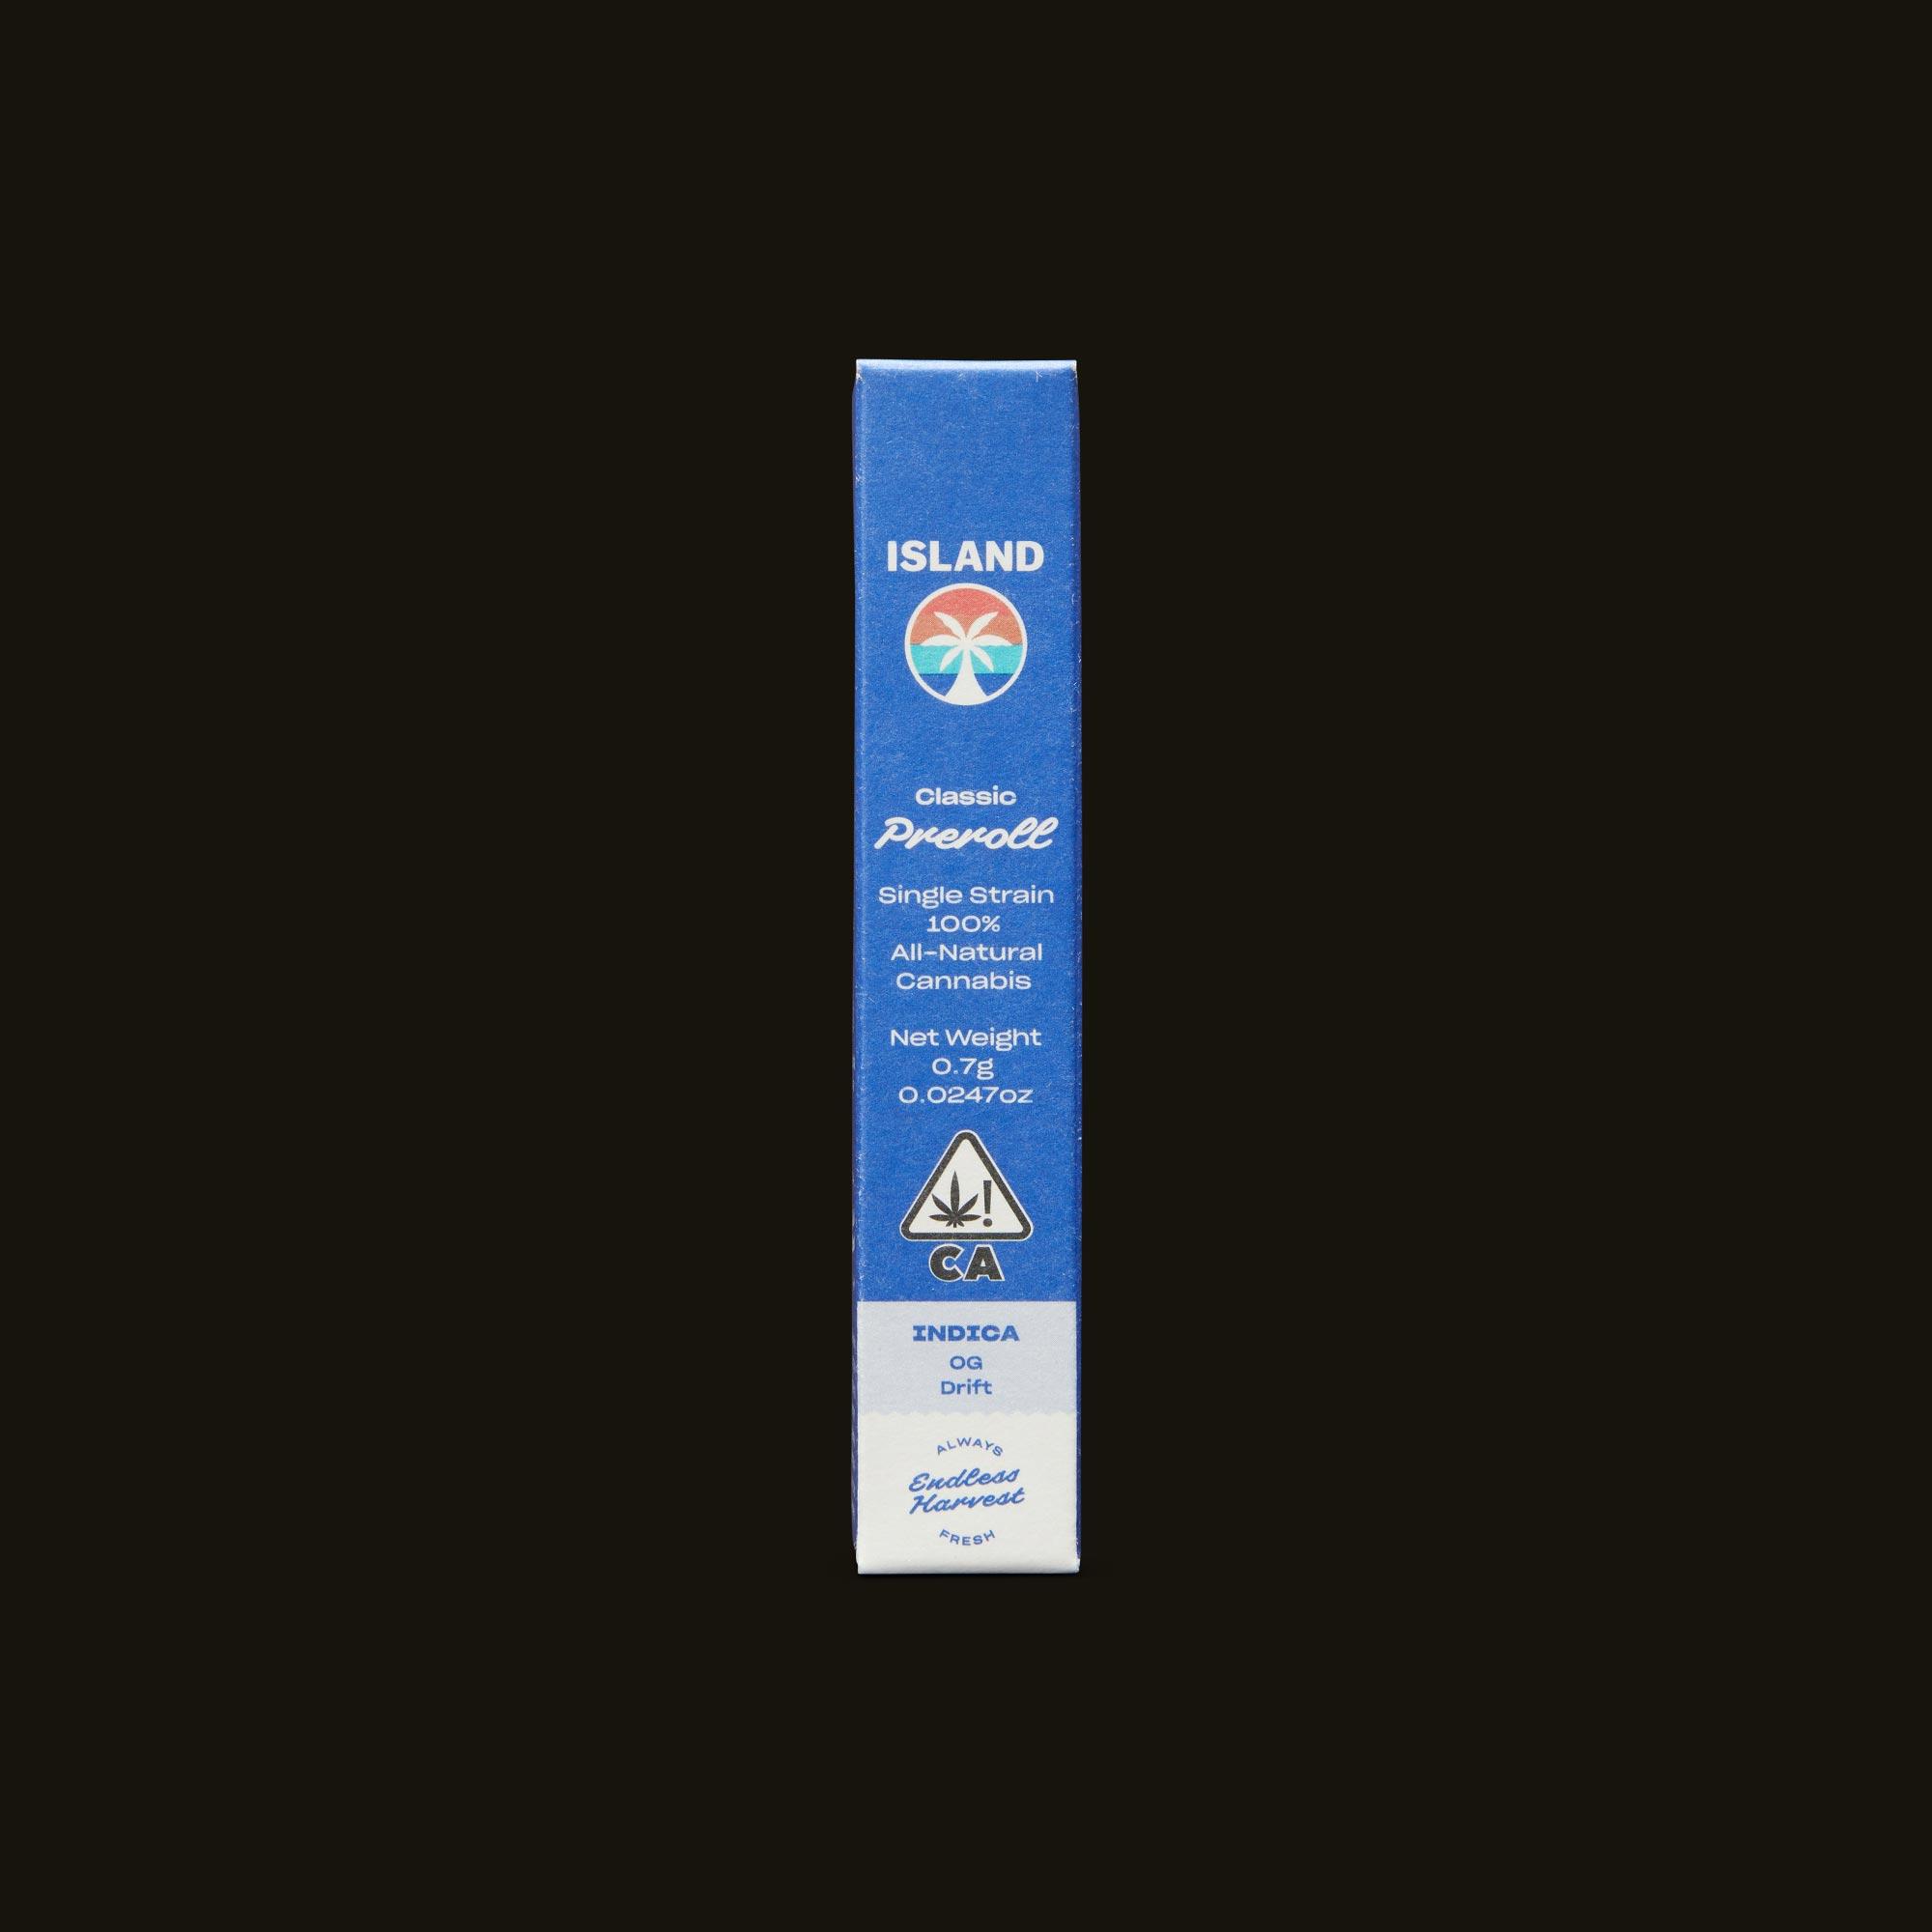 Island OG Drift Classic Front Packaging